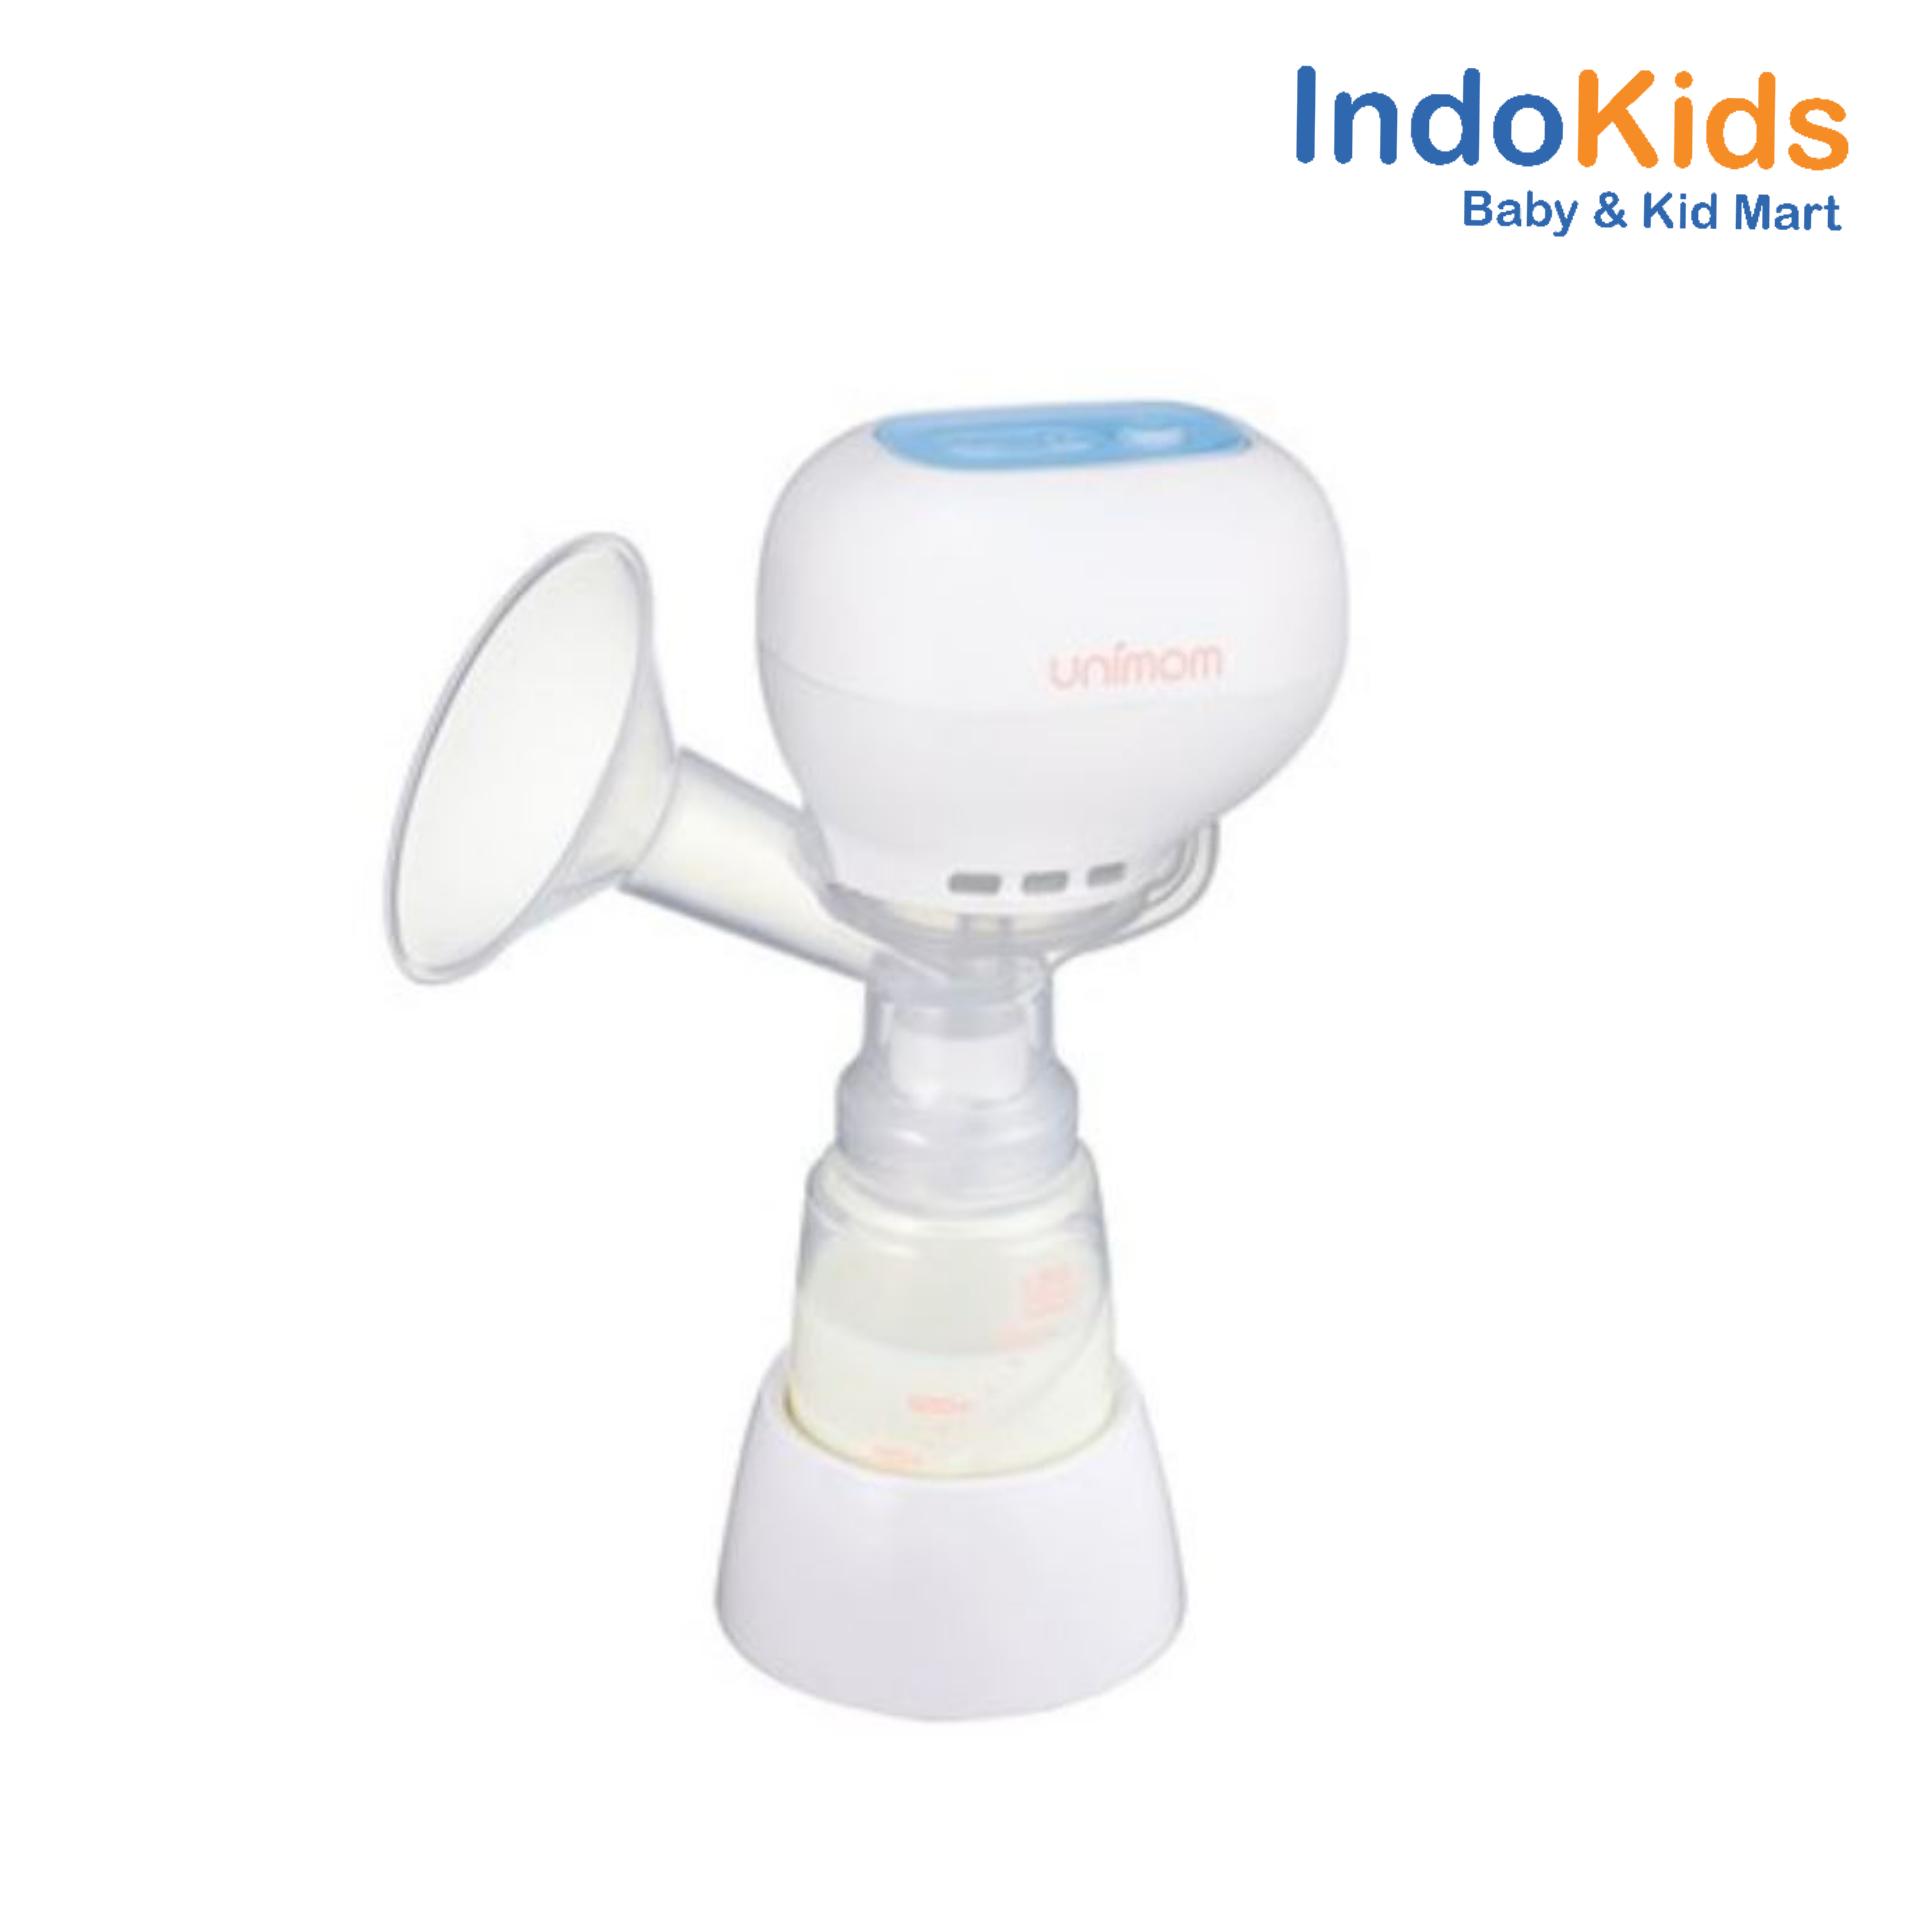 Unimom K-Pop Eco Electric Breast Pump